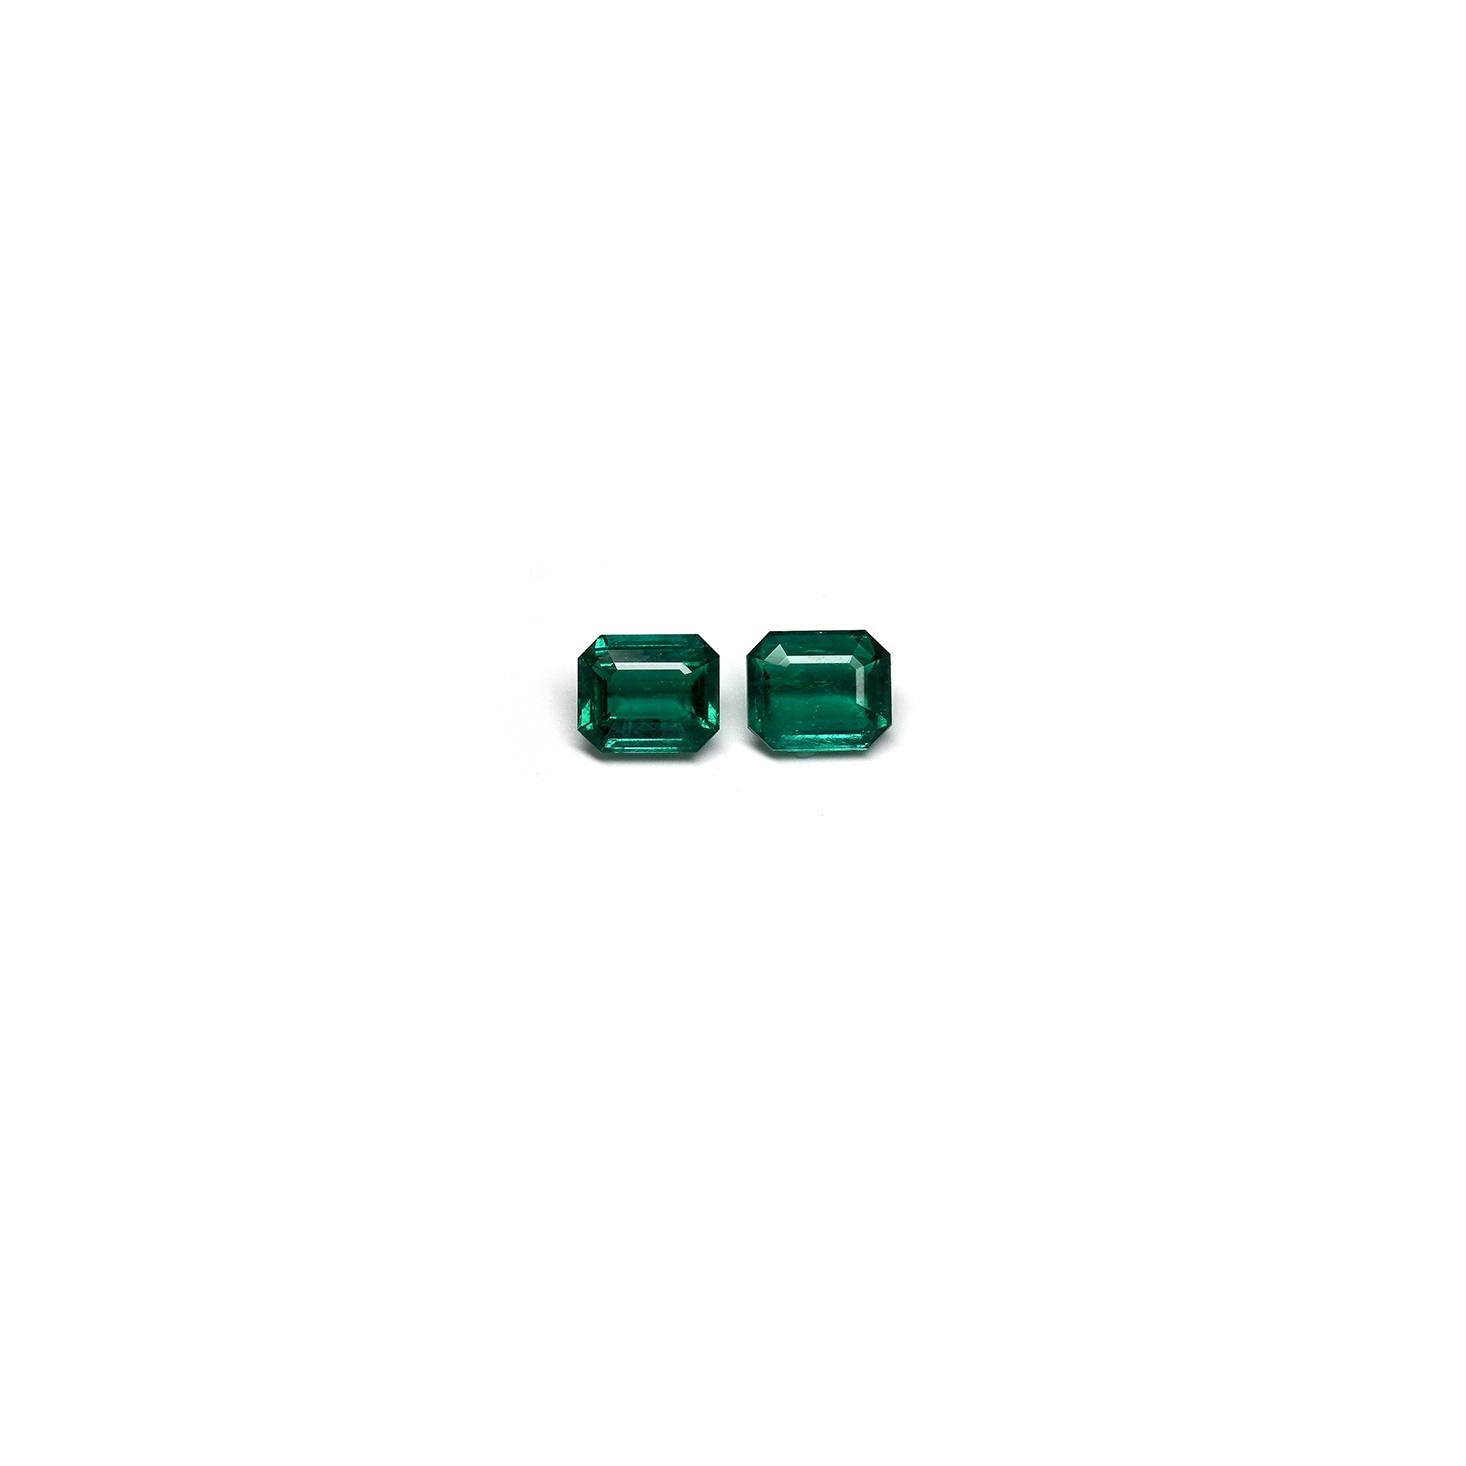 10 carat emerald cut pair